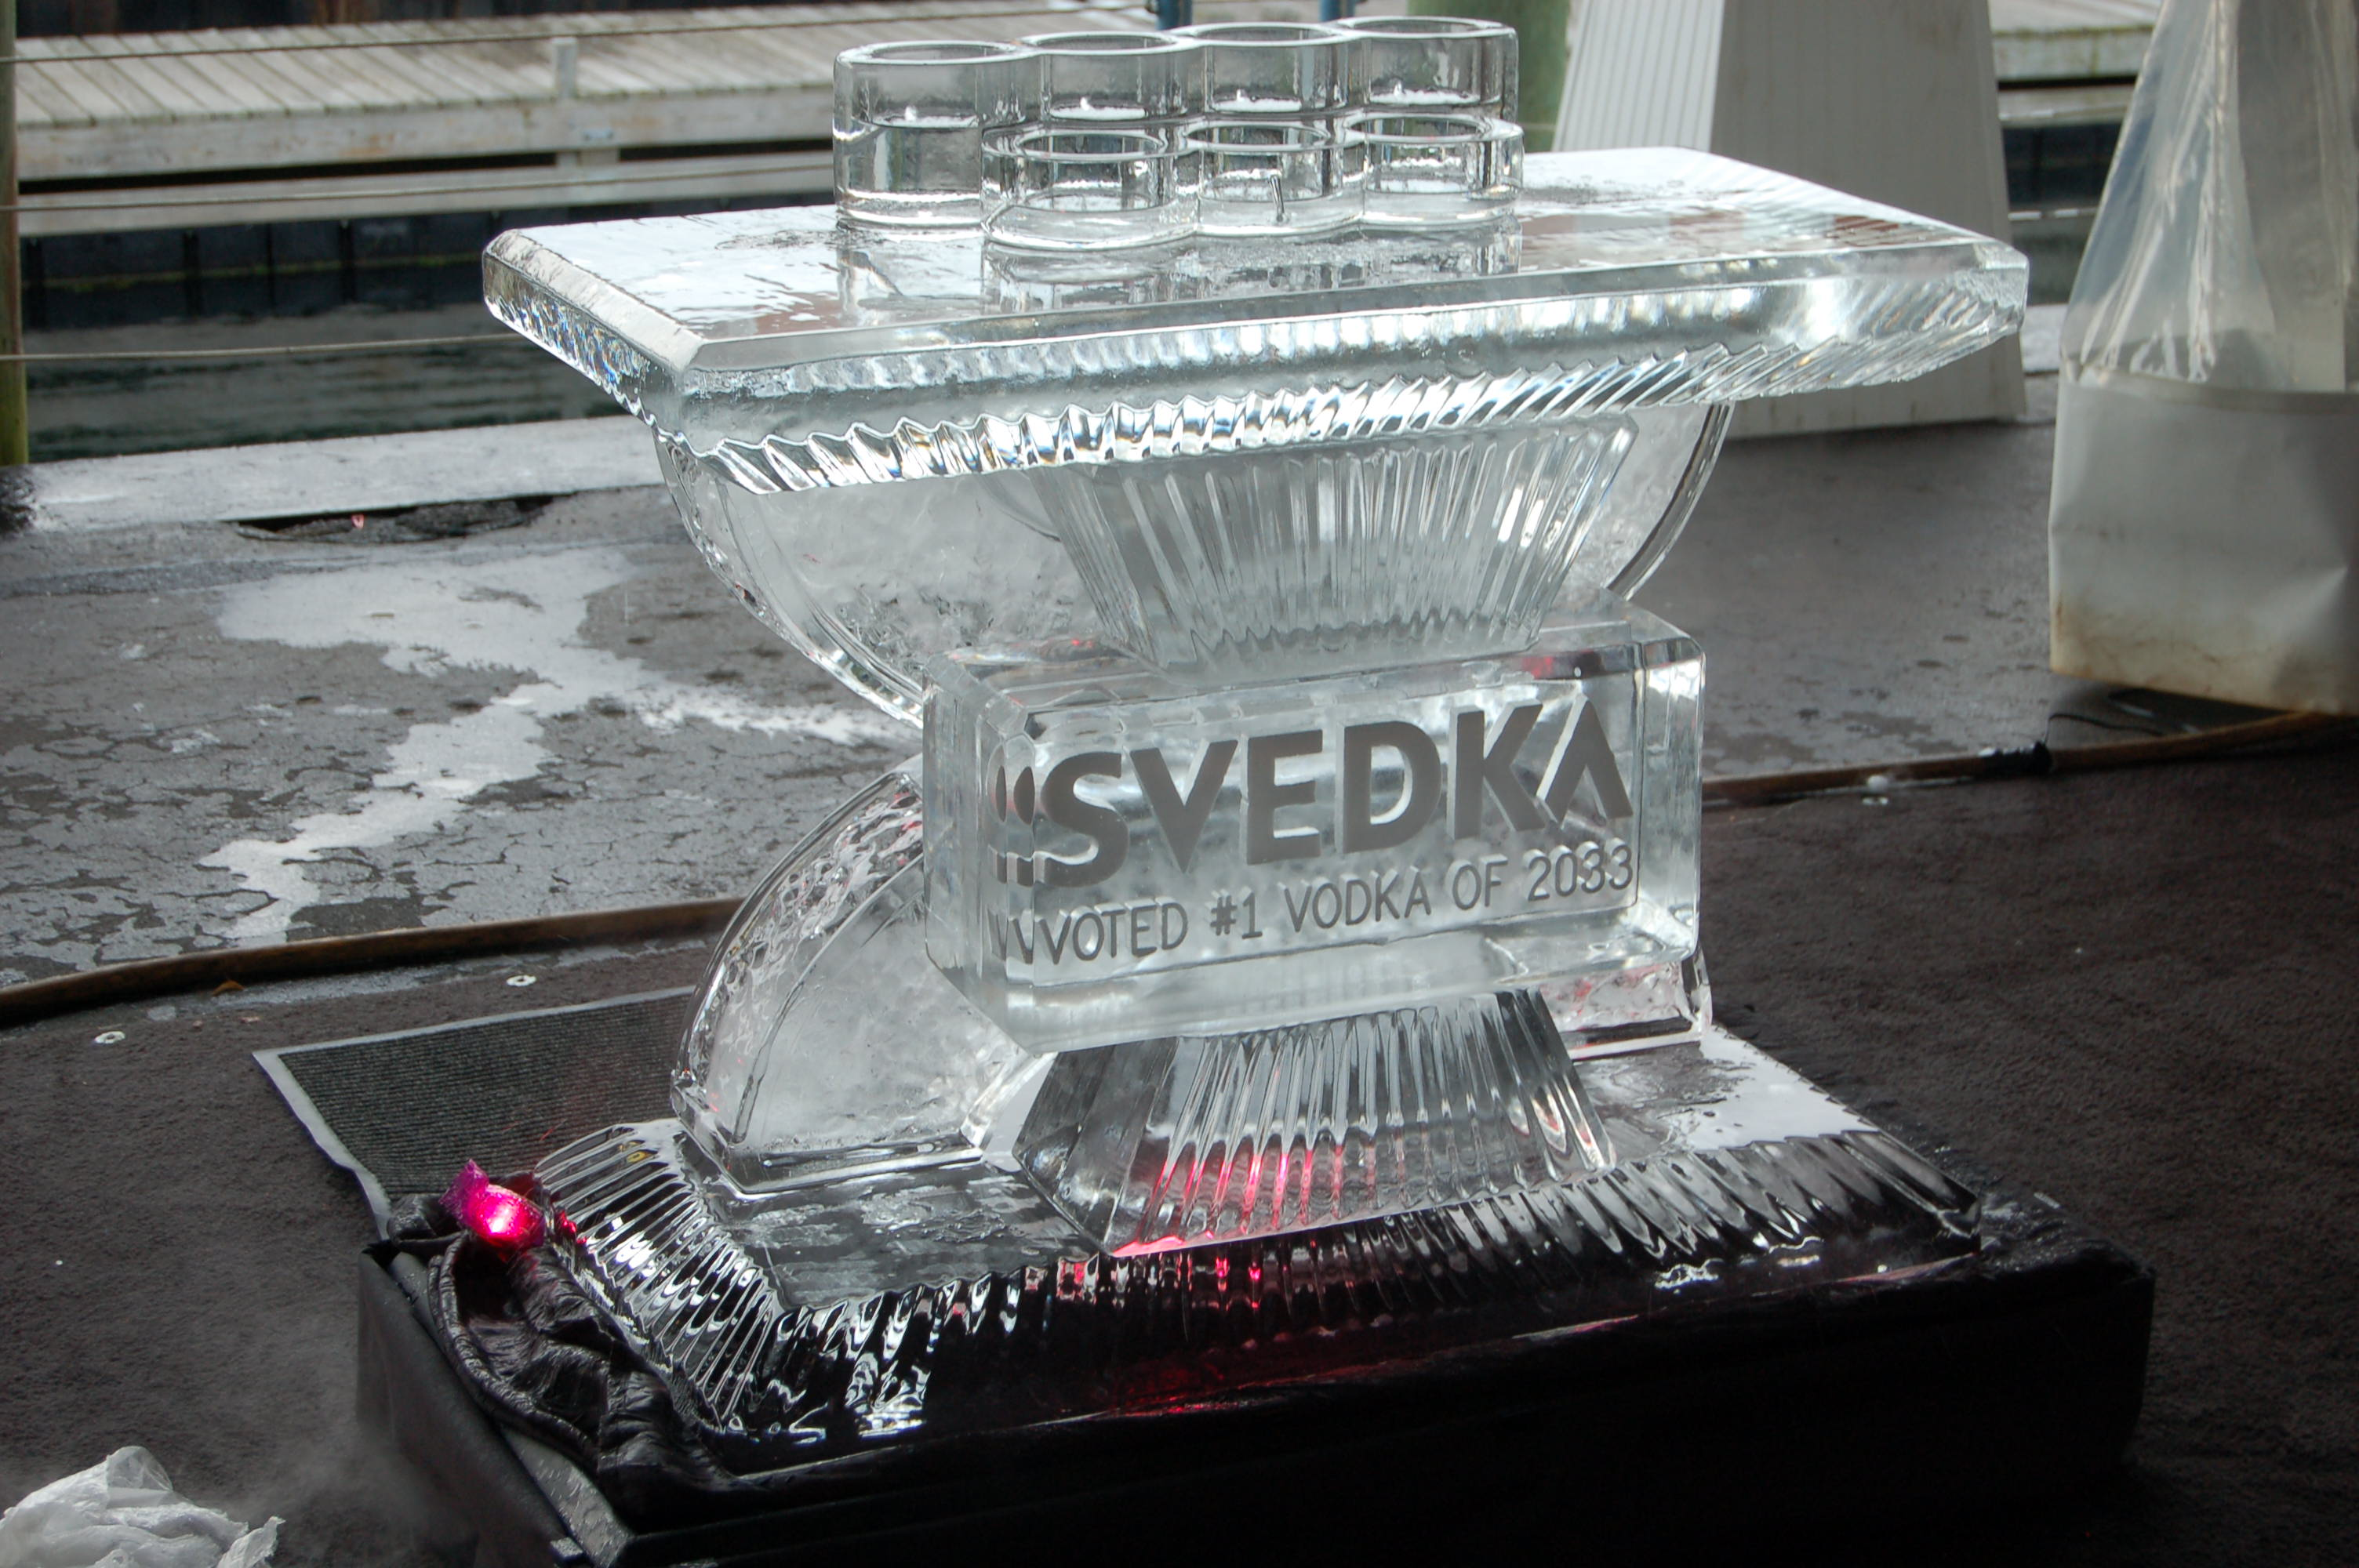 Svedka Mini Ice Bar